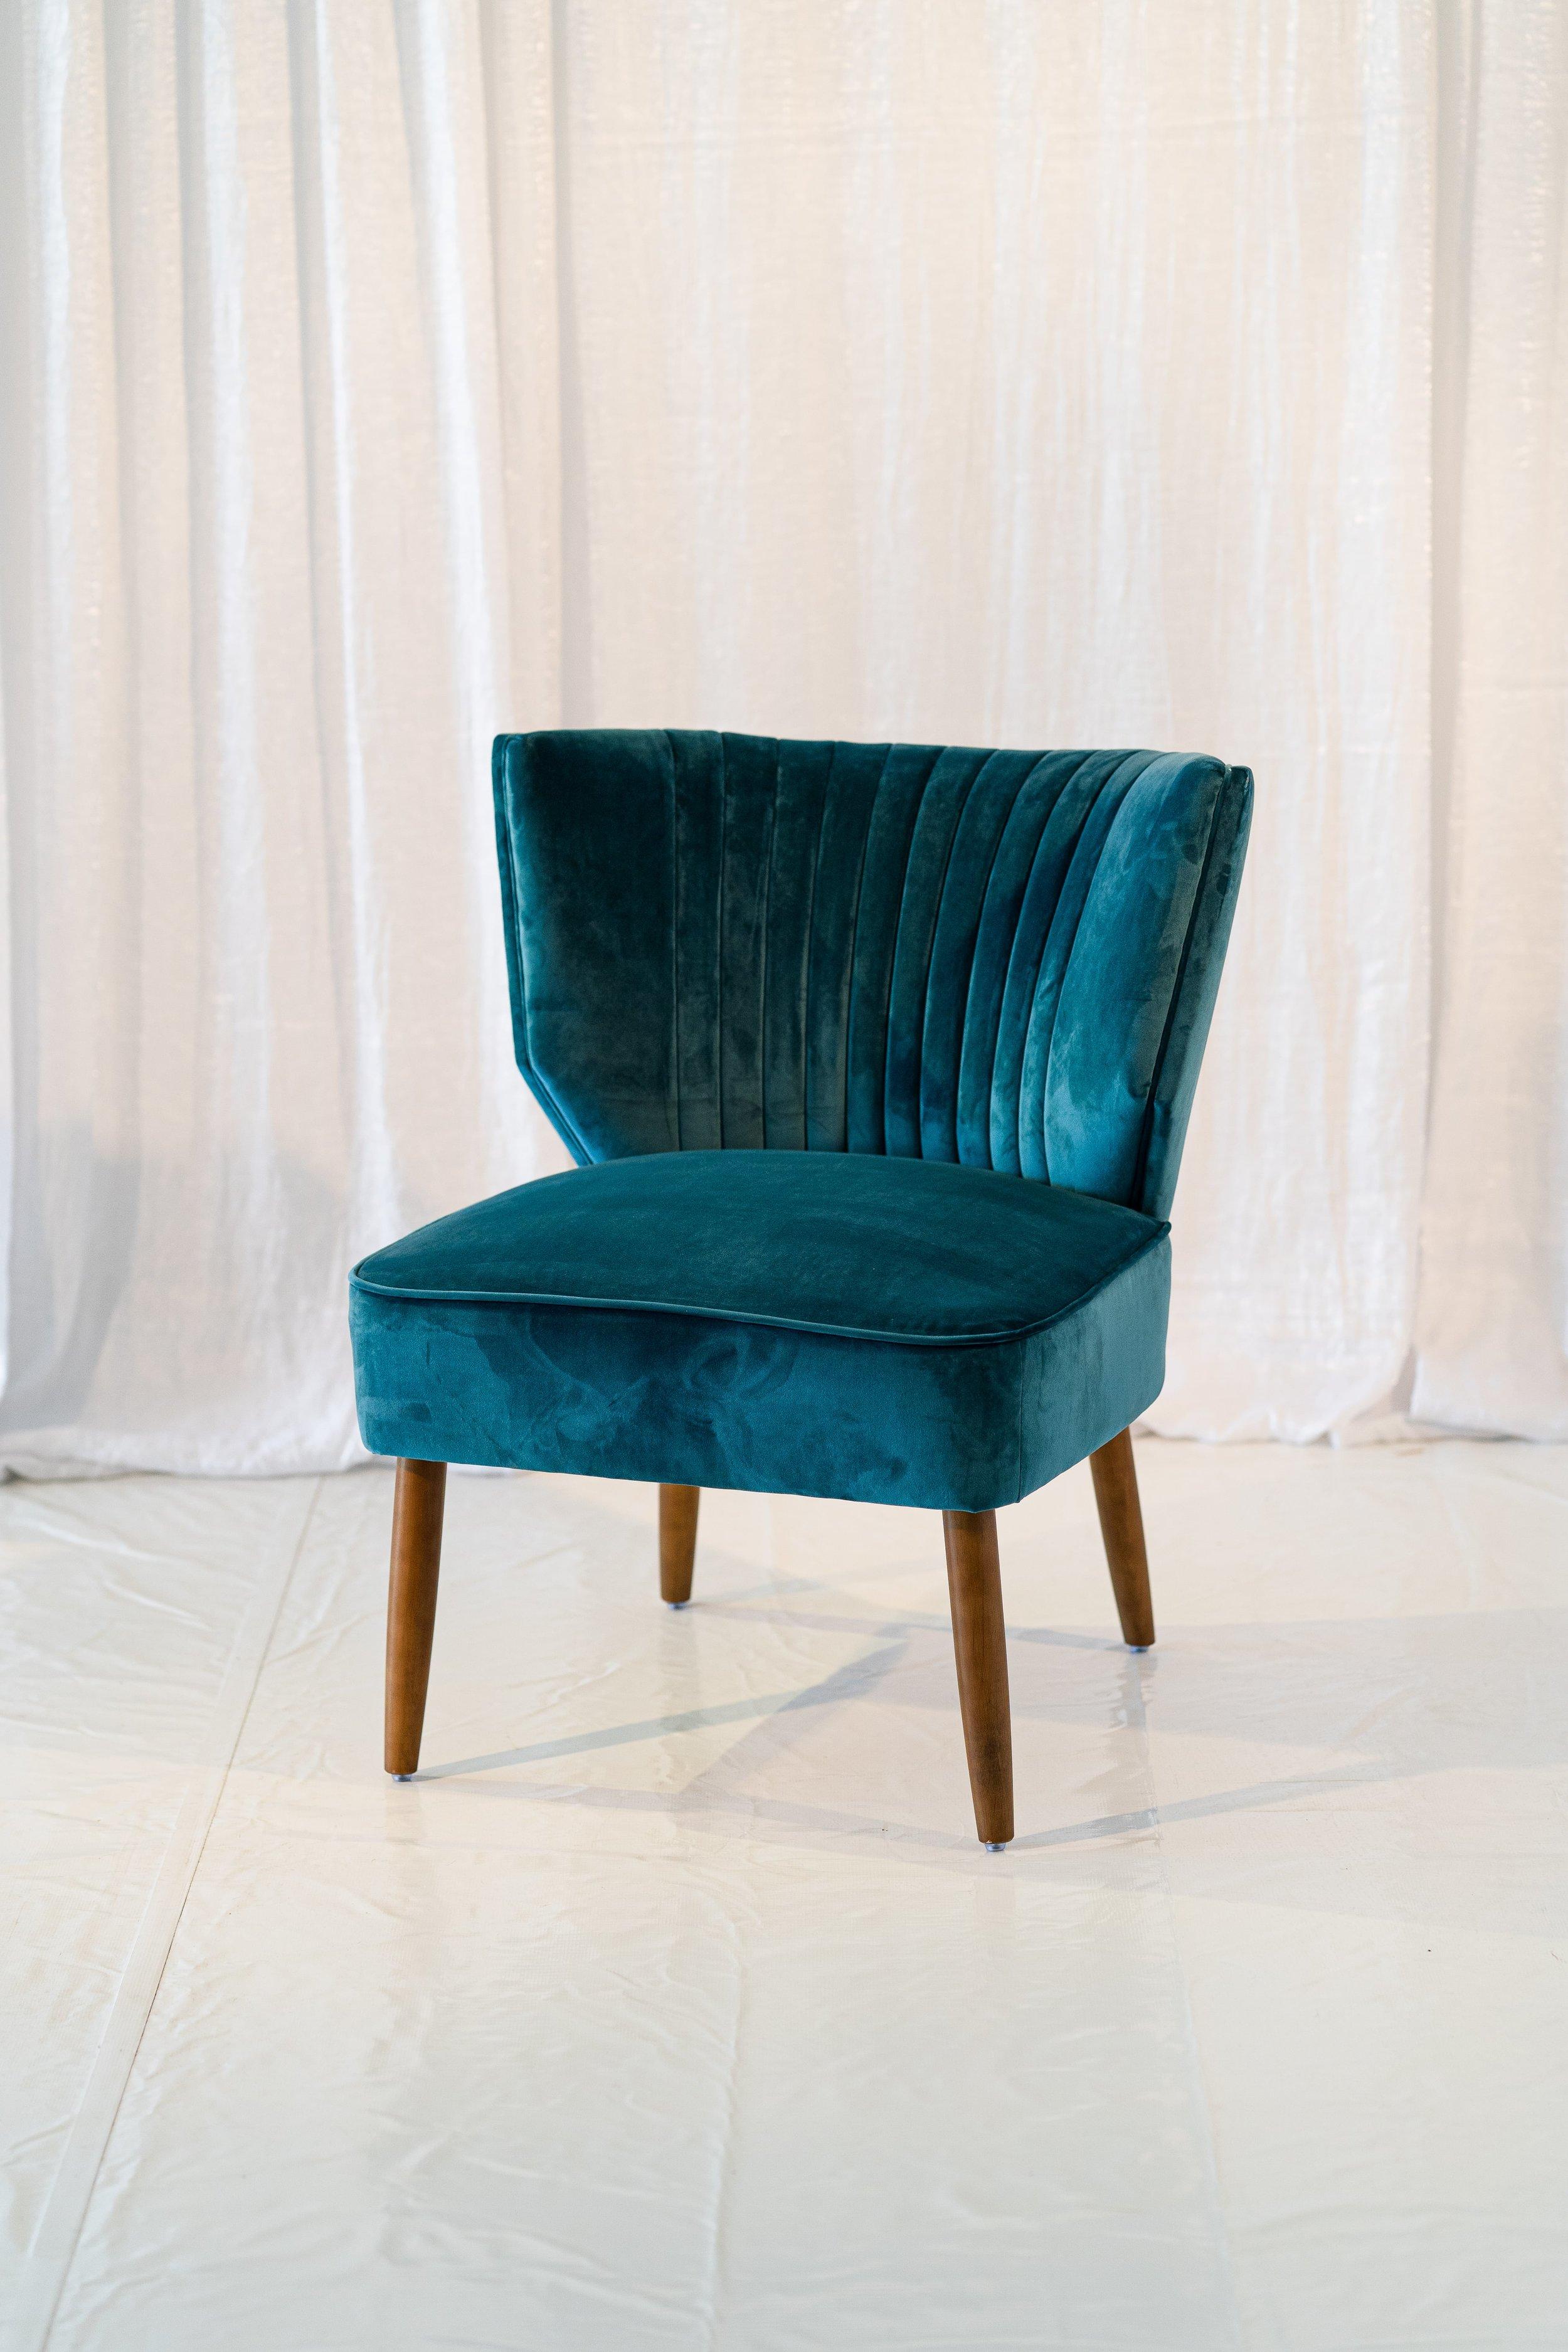 vintage chair images2-min.jpg